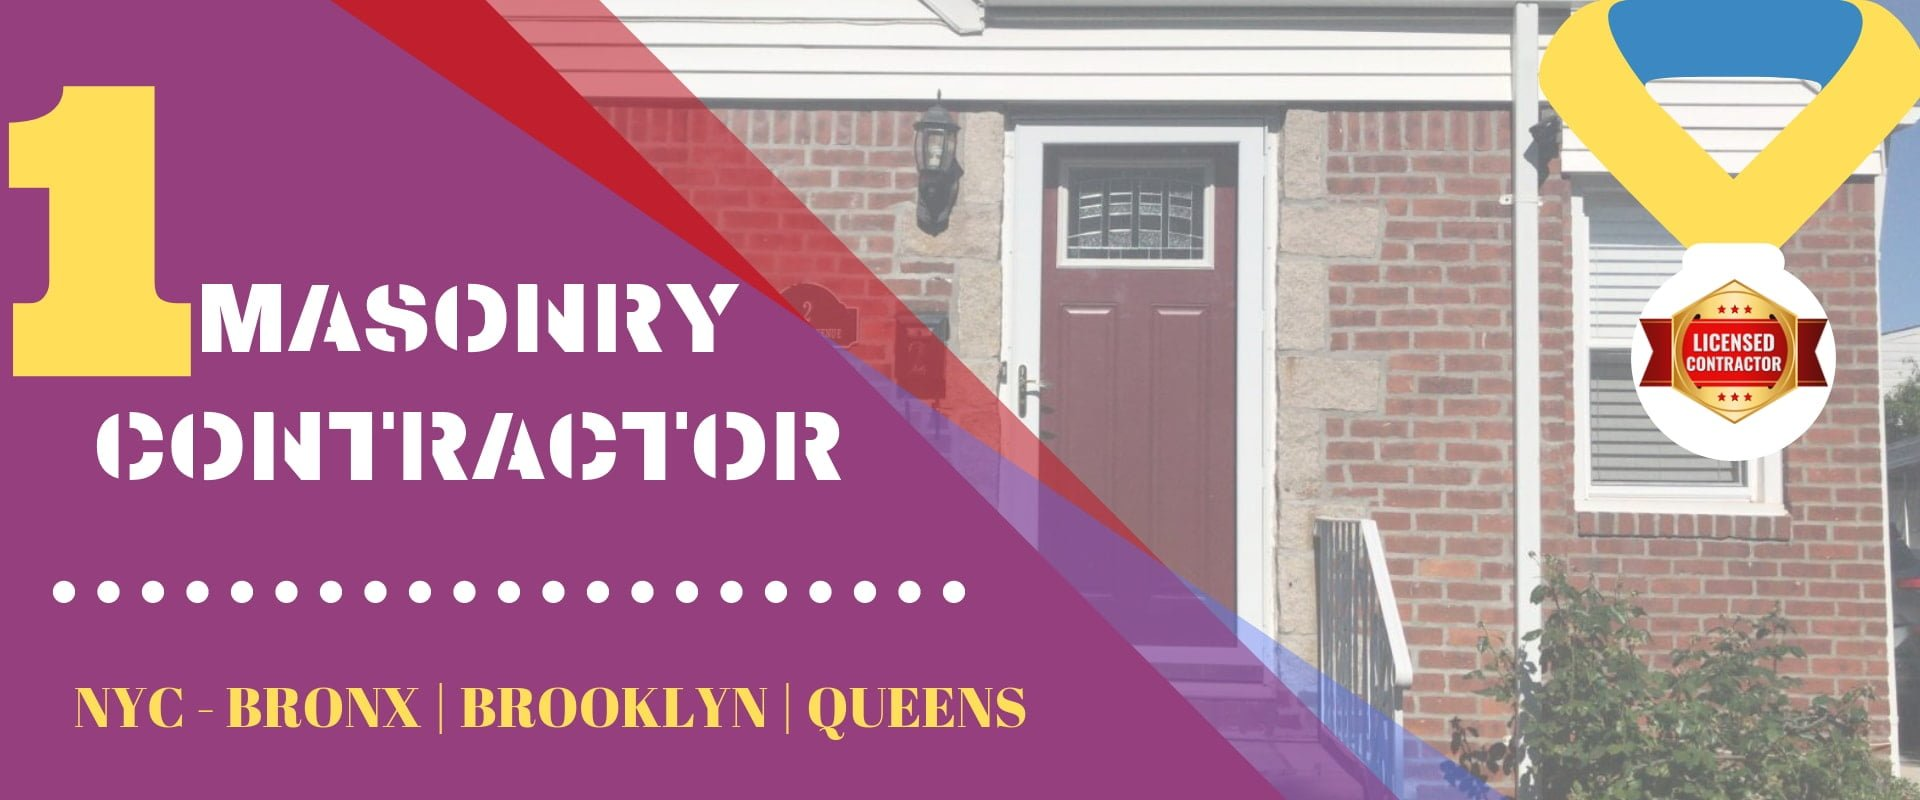 Masonry Contractors NYC - Brick Pointing, Stucco Repair